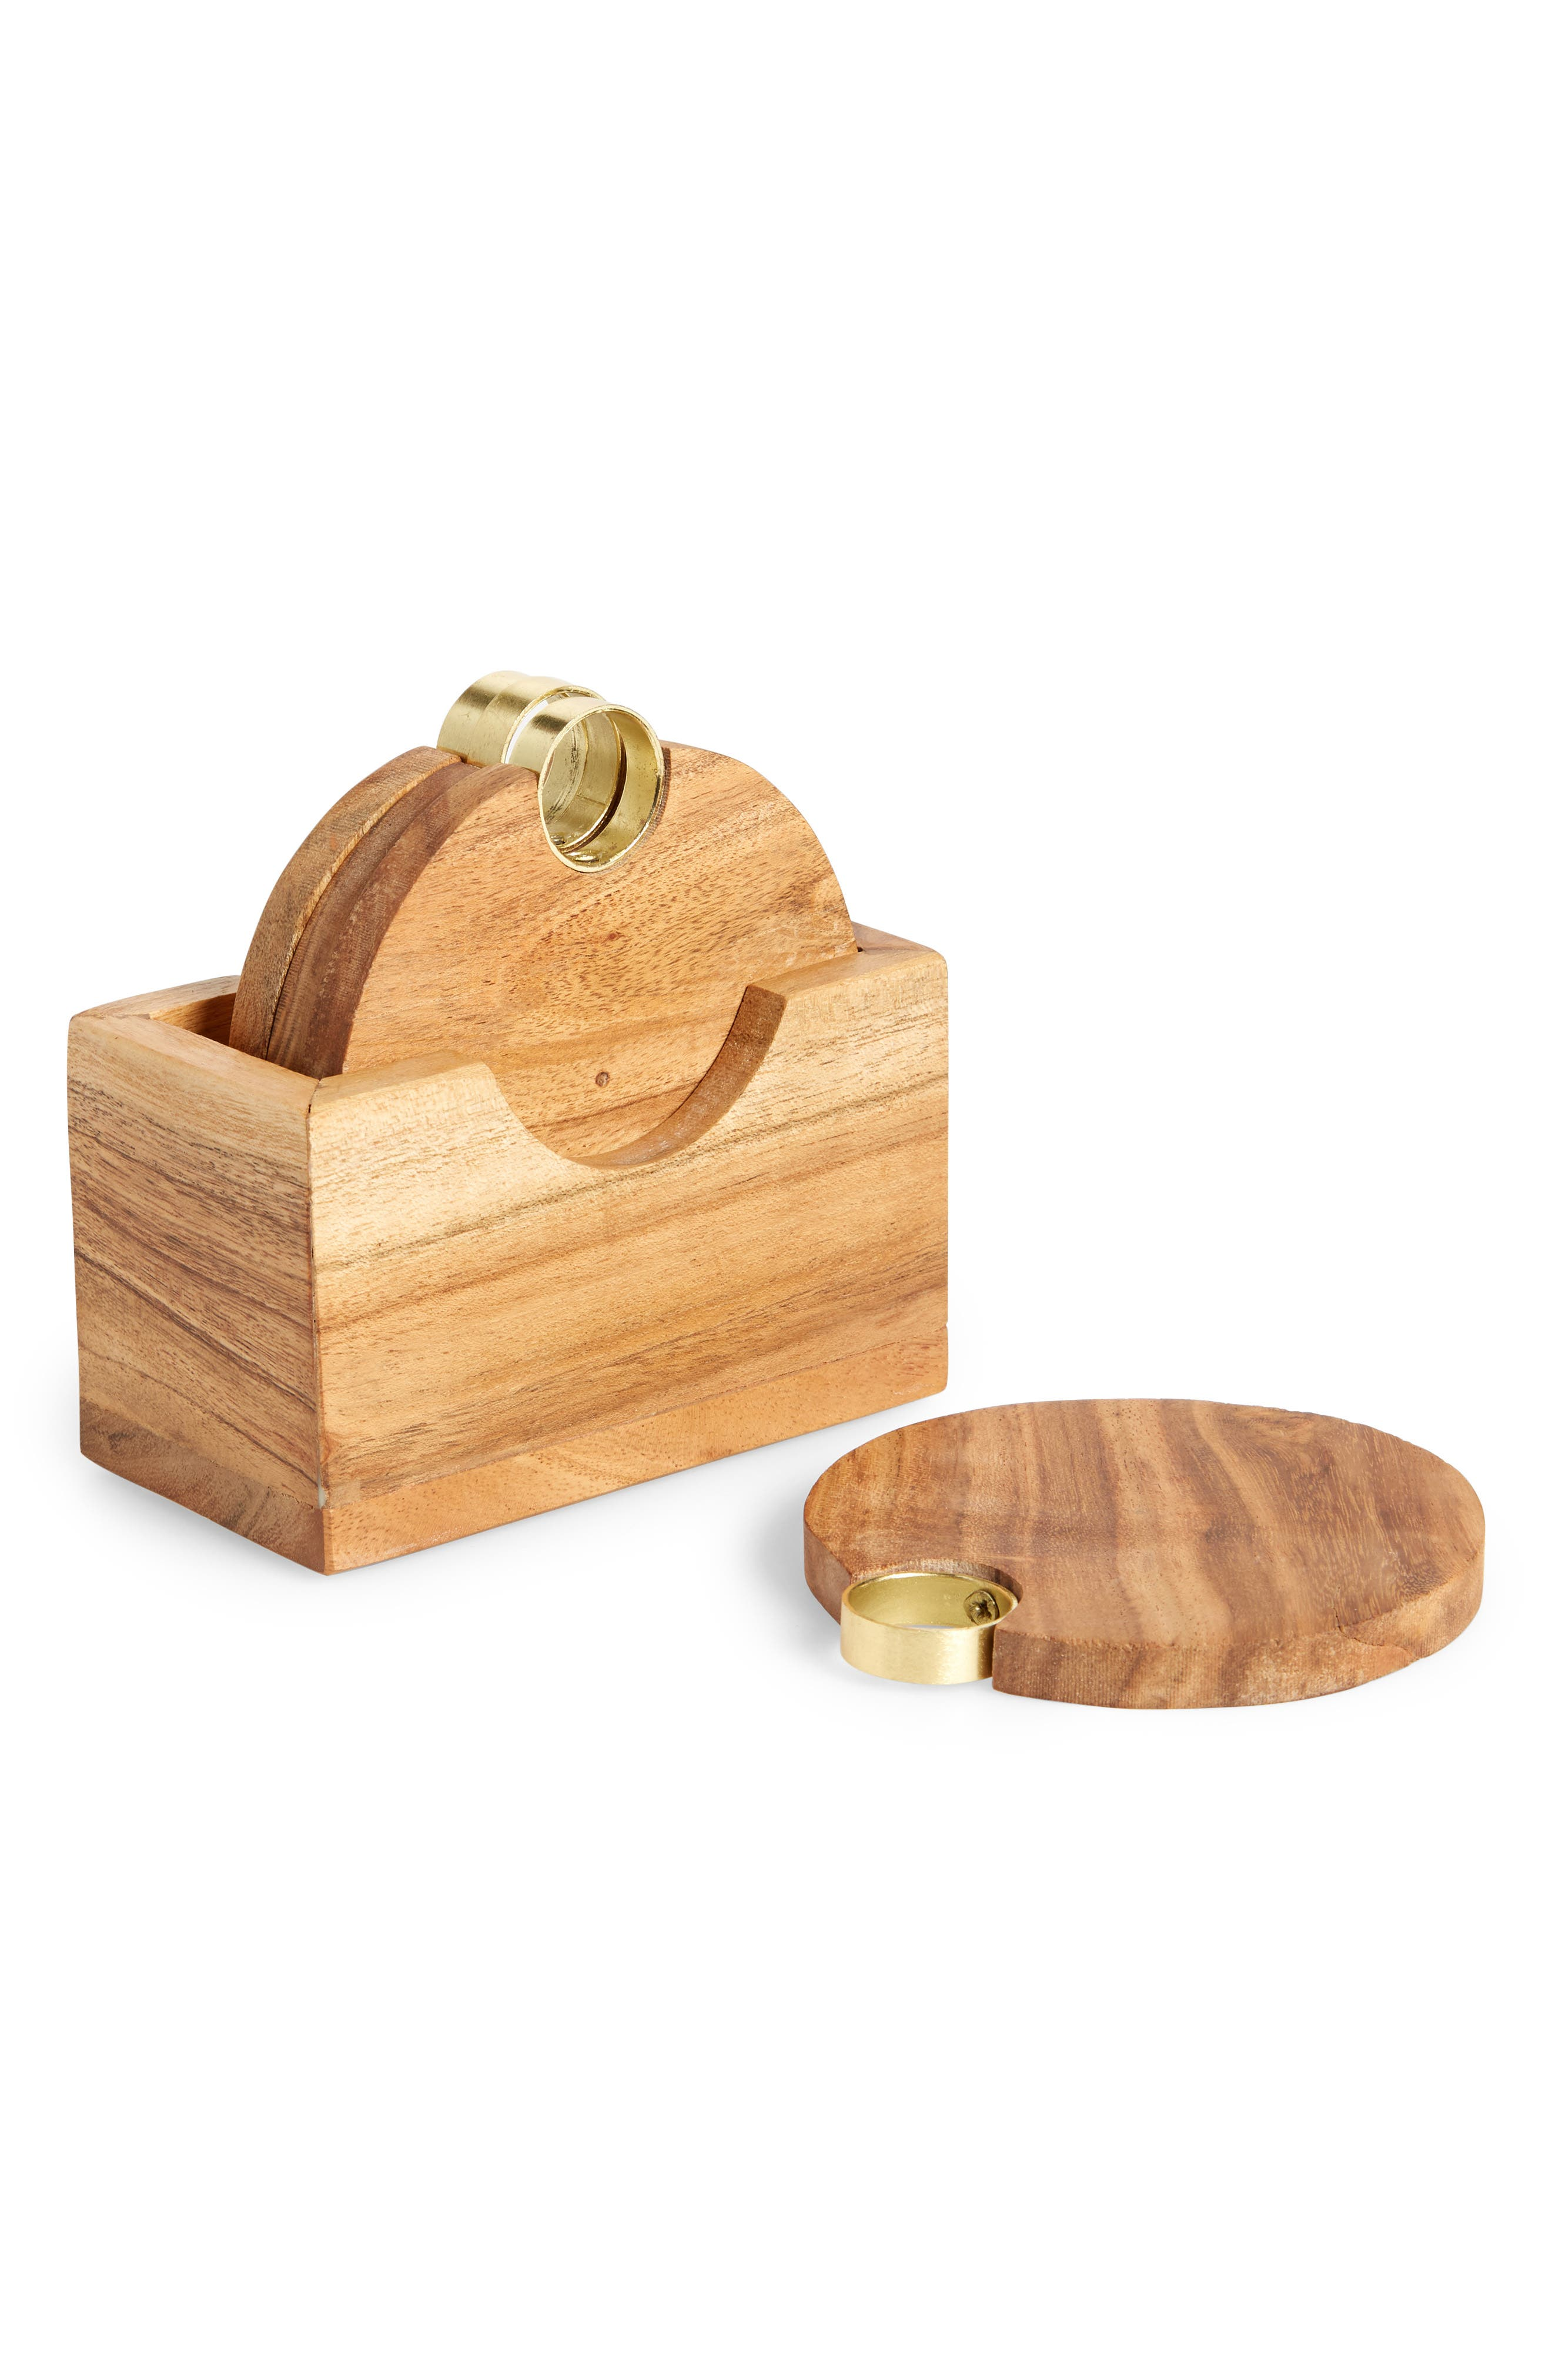 5-Piece Acacia Wood Coaster Set,                             Main thumbnail 1, color,                             GOLD METALLIC